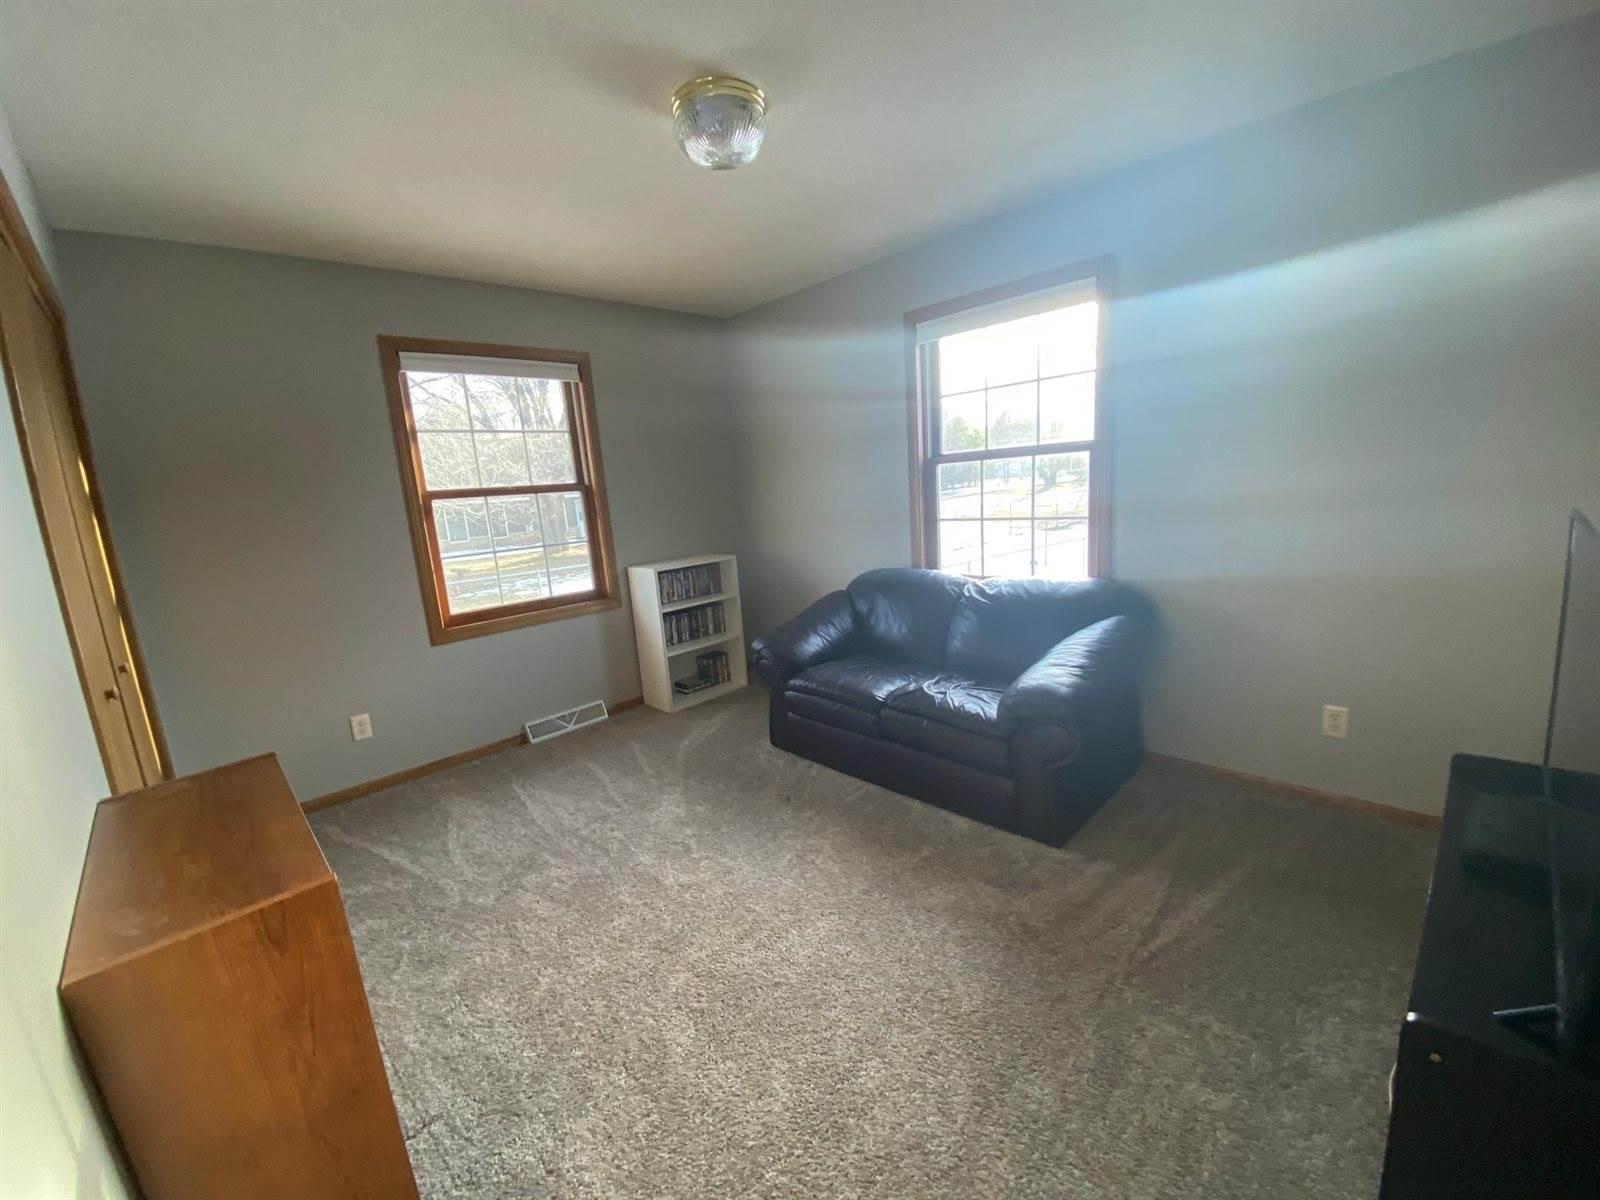 927 West 2nd Street, Pillager, MN 56473